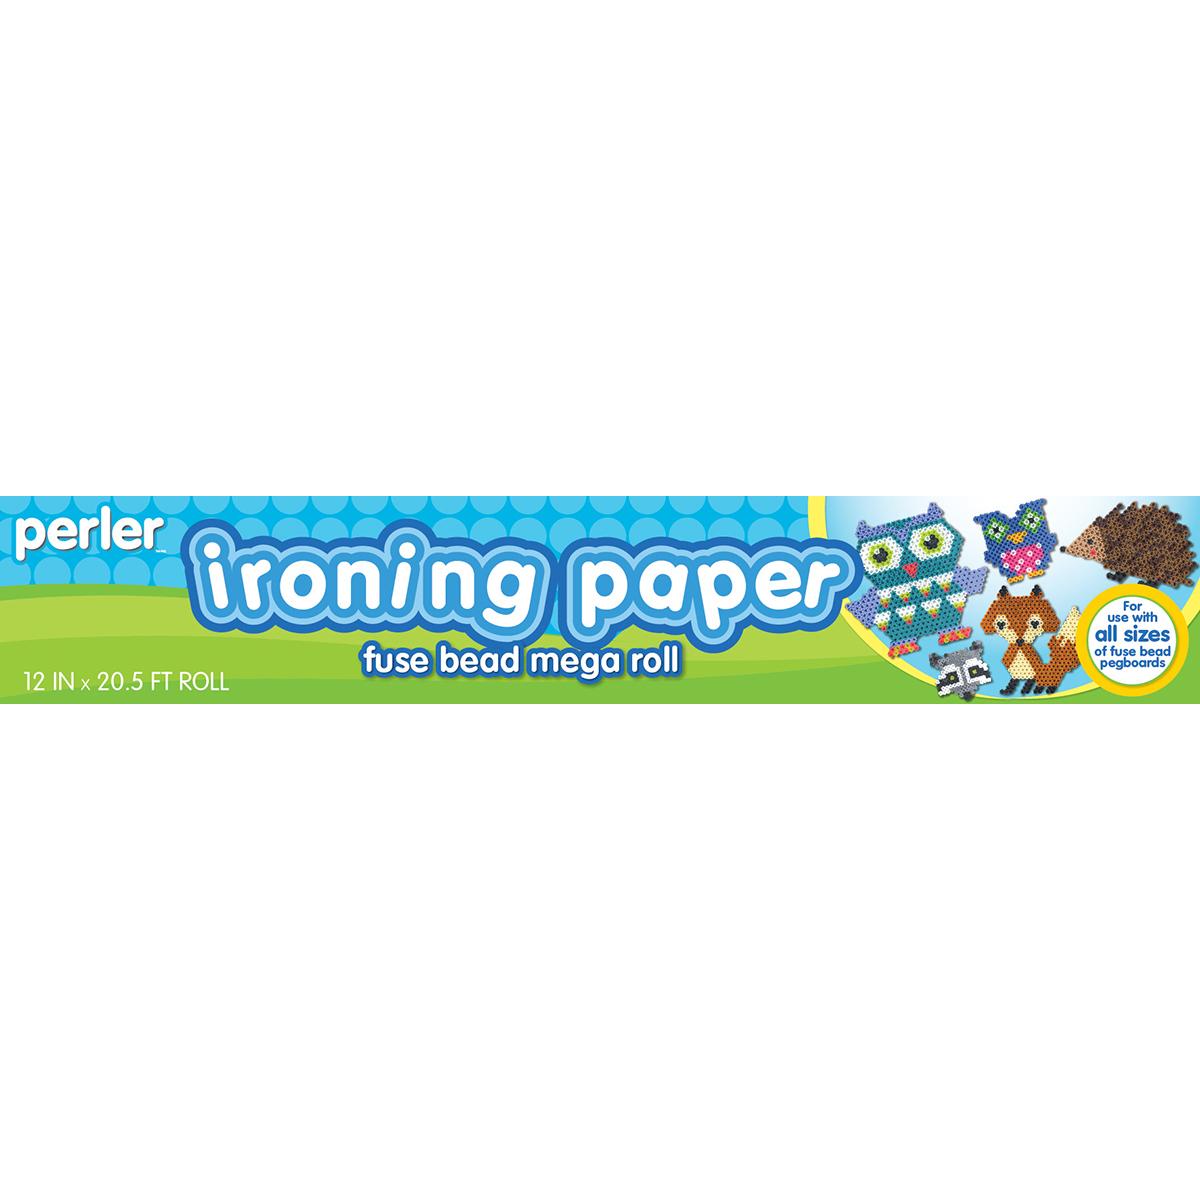 Perler Ironing Paper 12X20.5' Mega Roll-